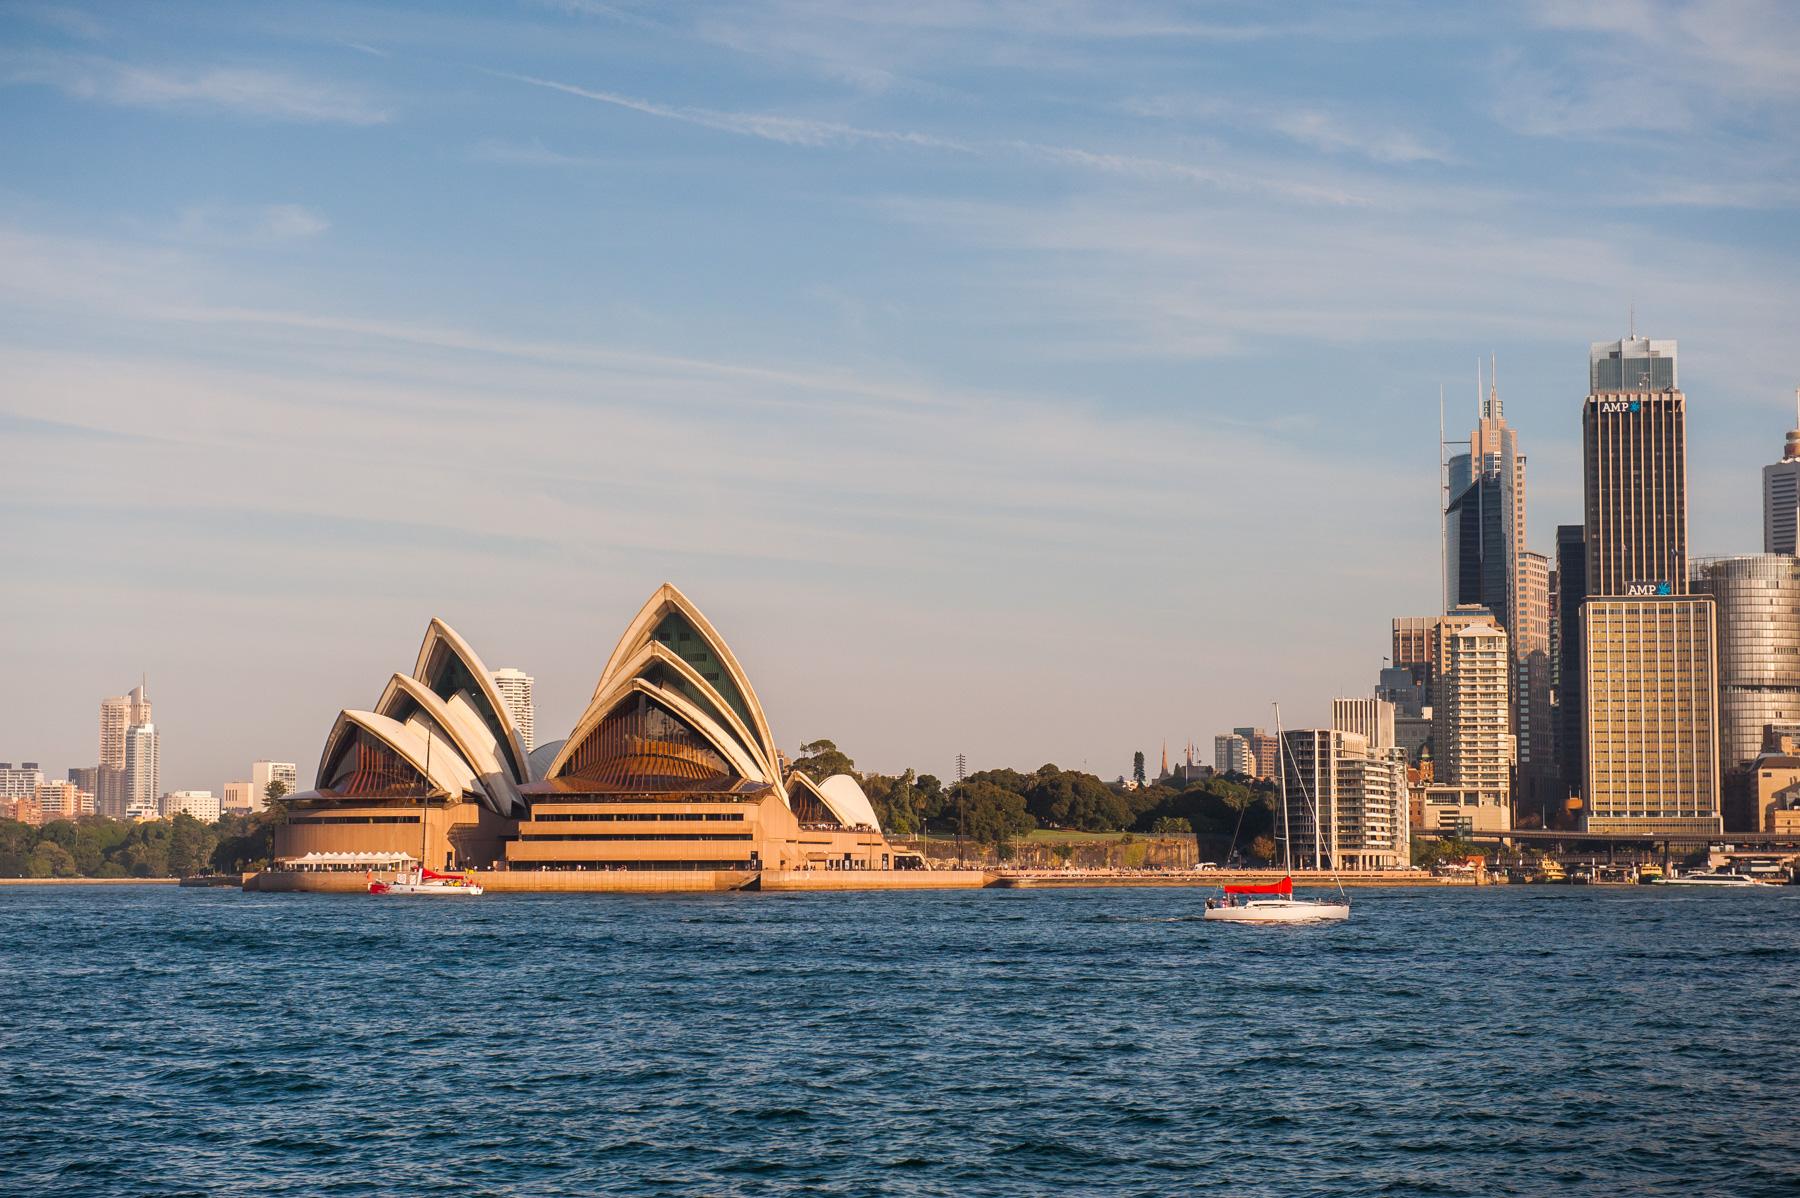 Jeffery Street Wharf | Kirribilli |Sydney Opera House | View from foreshore